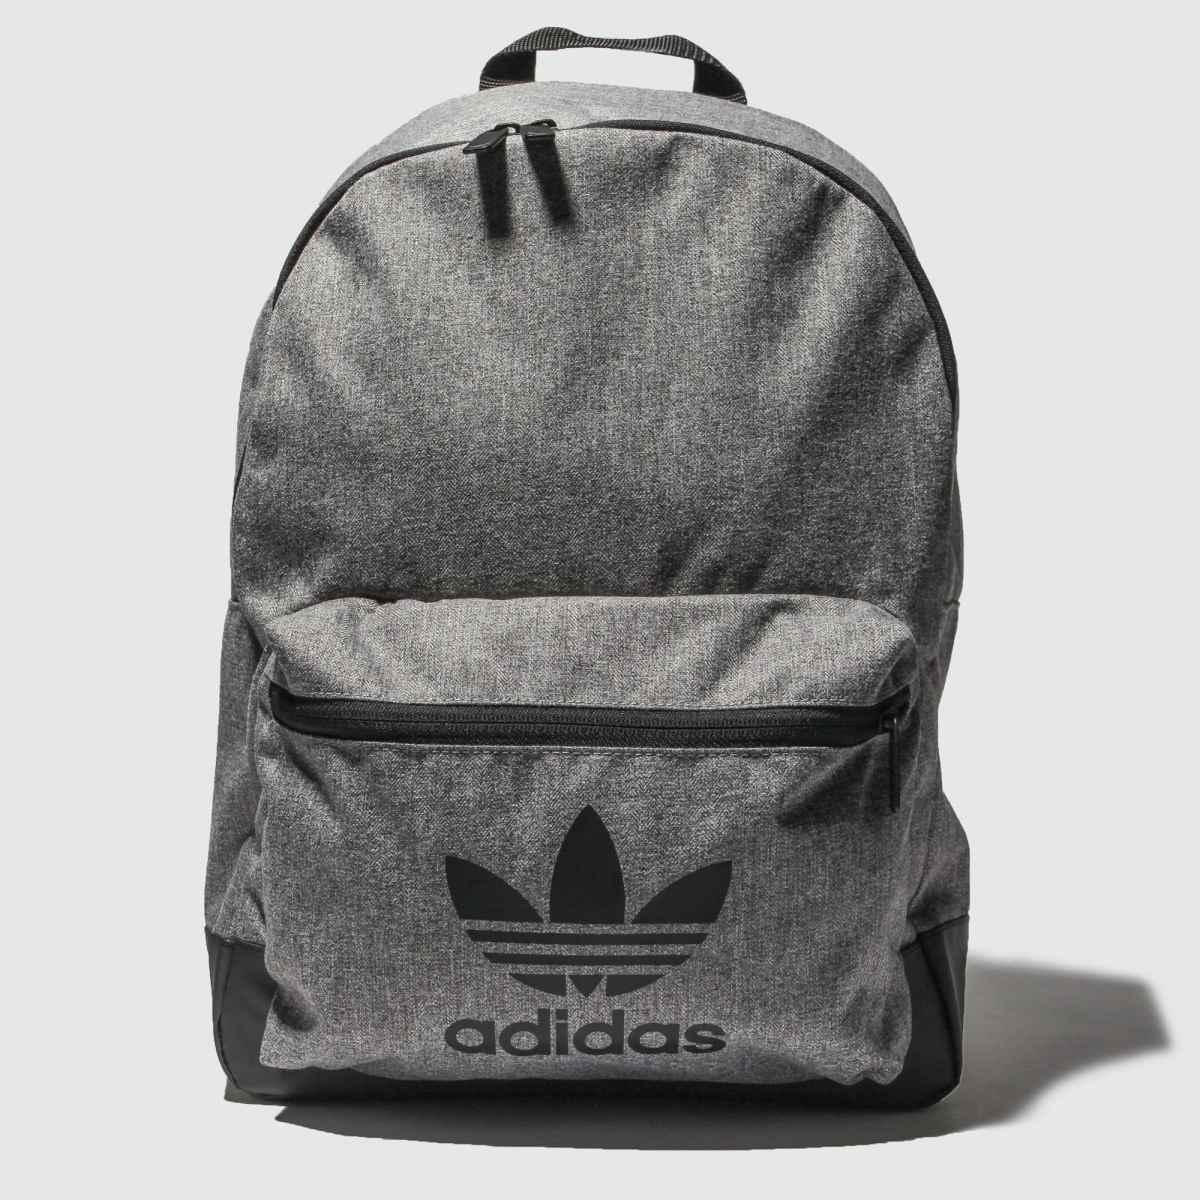 Image of Adidas Black & Grey Mel Classic